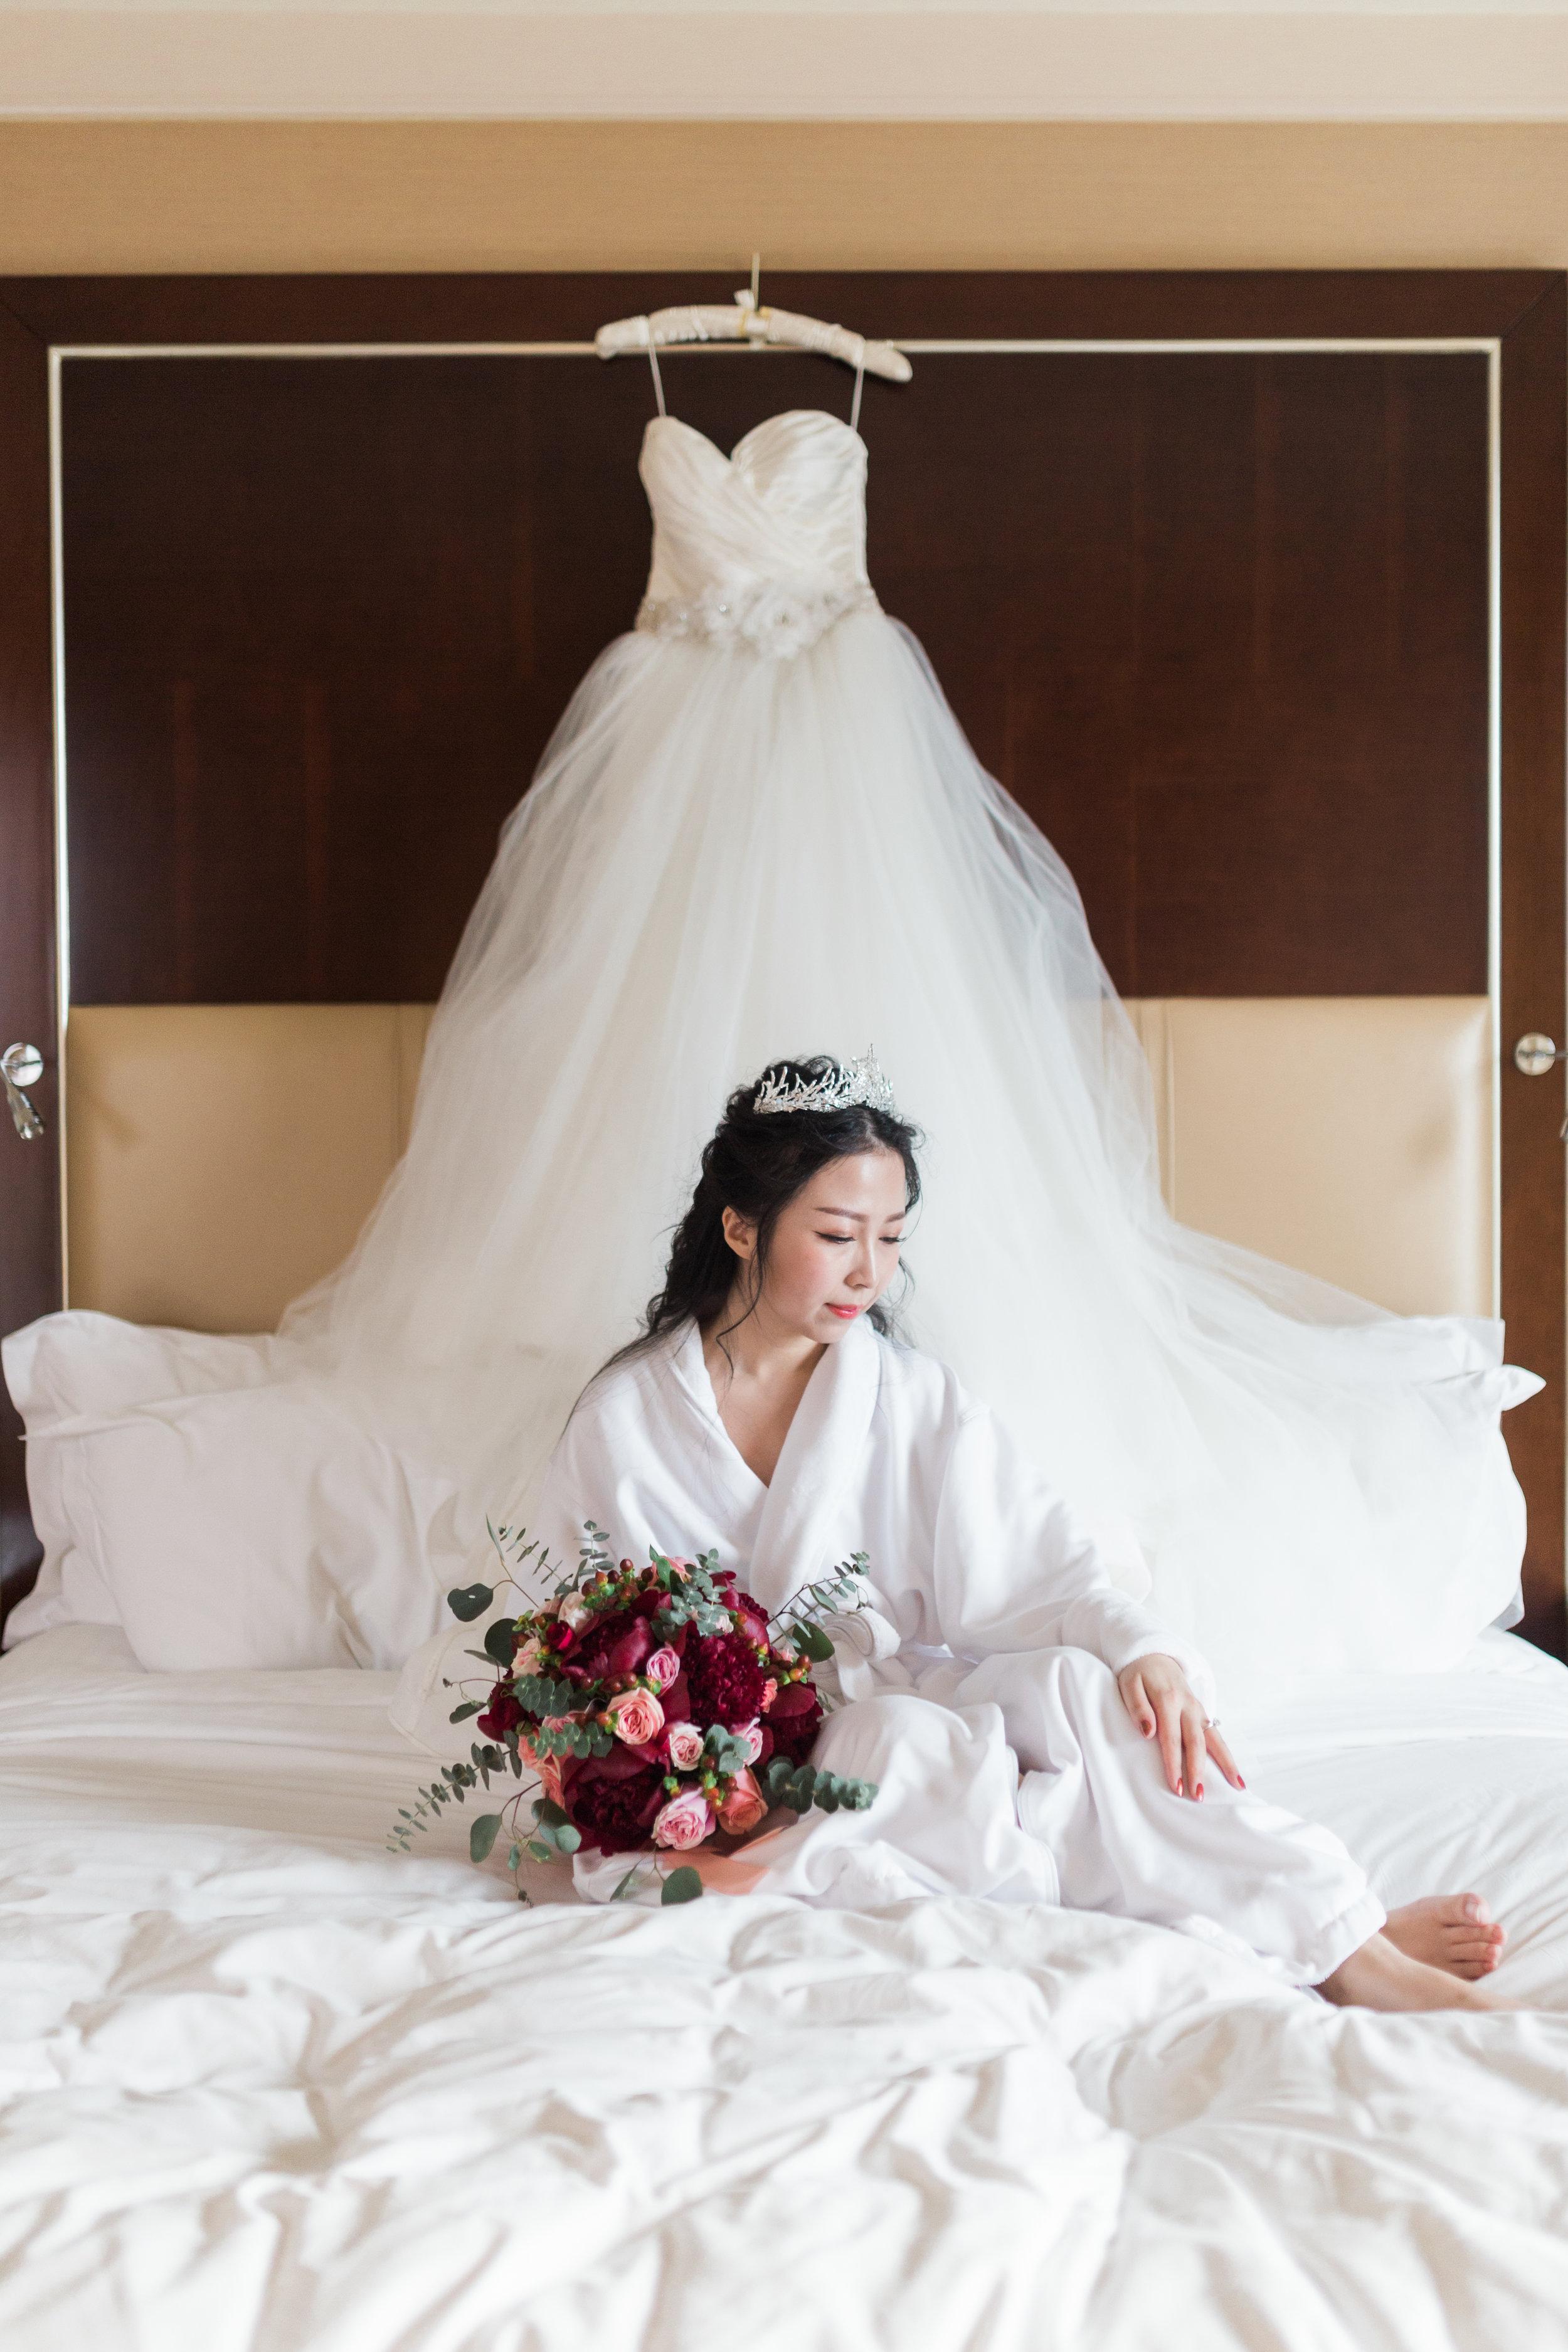 Parkview Manor Wedding - Bride Getting Ready-26.jpg